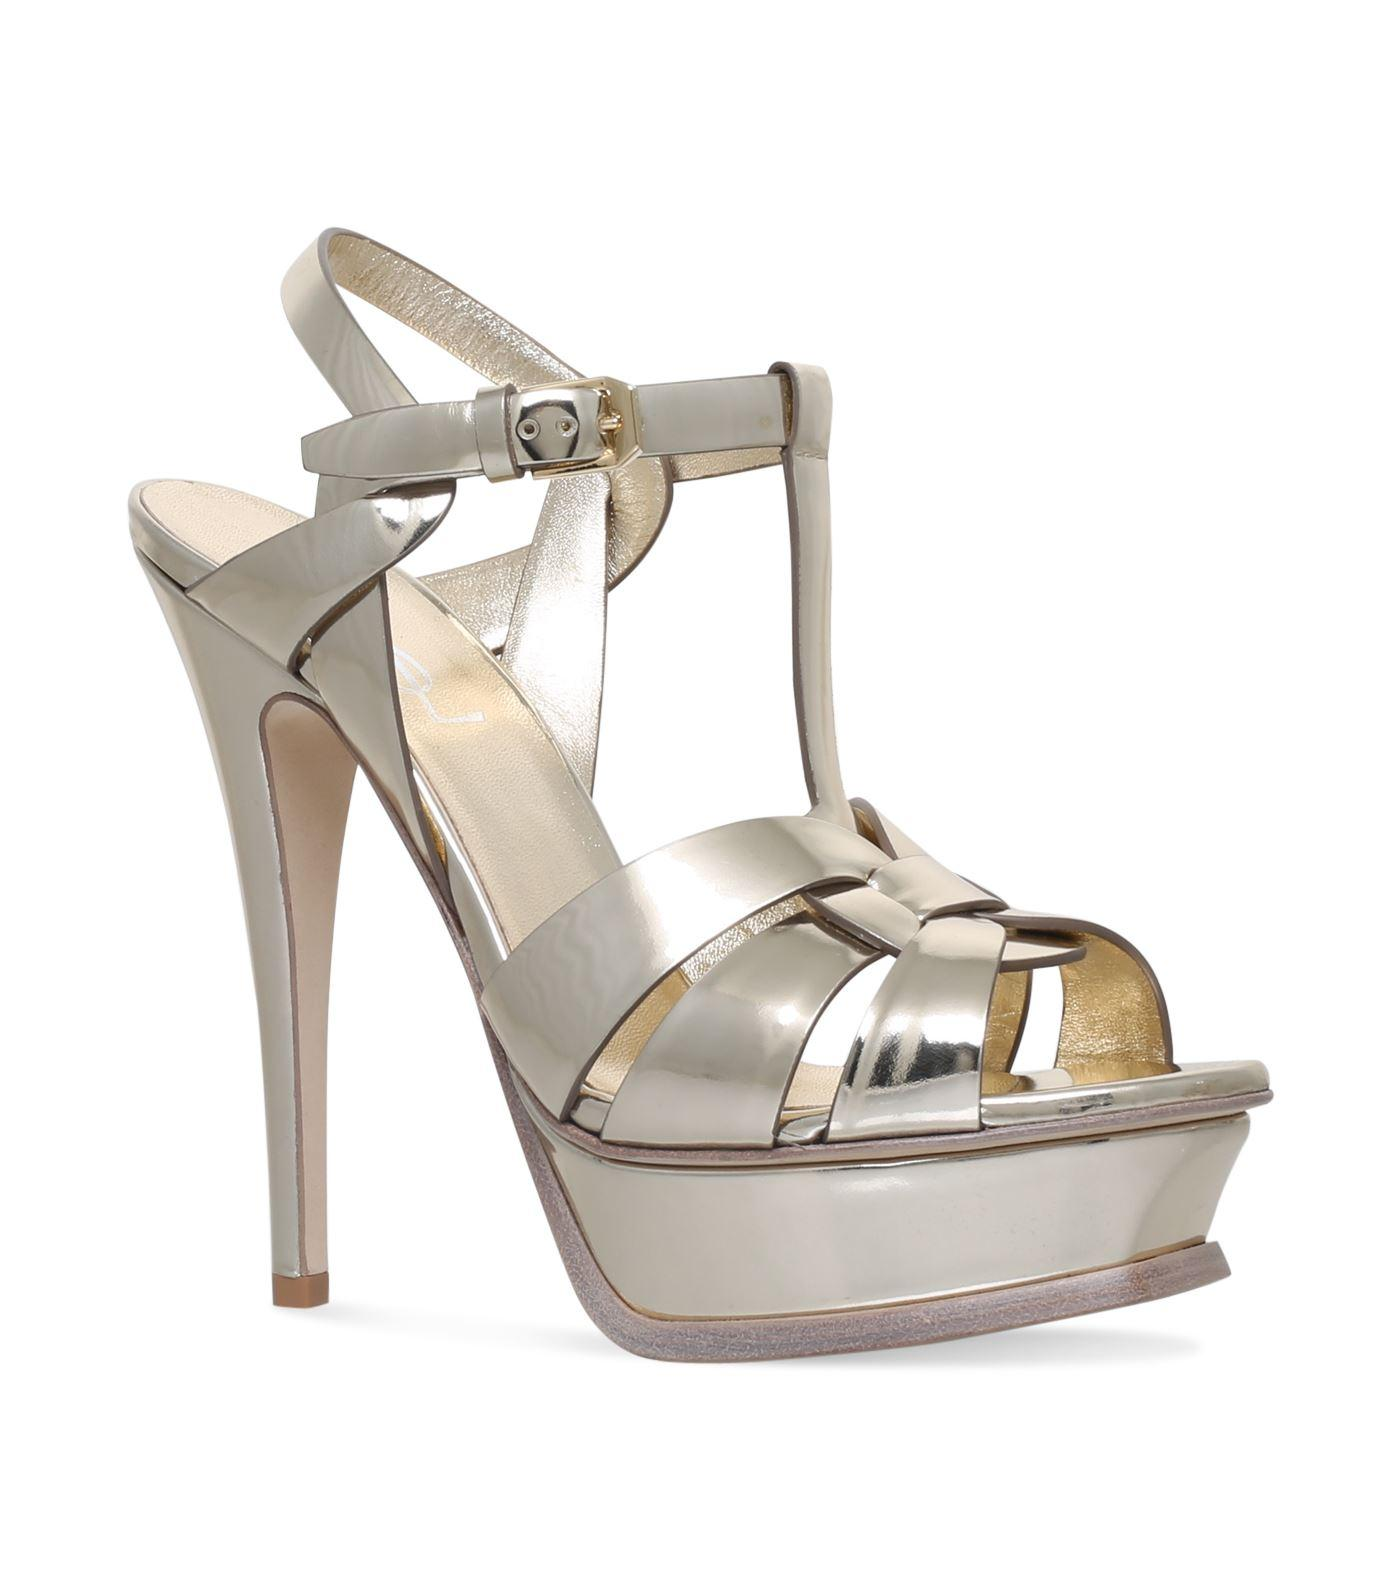 Saint Laurent Patent Tribute Sandals 105 In Brown